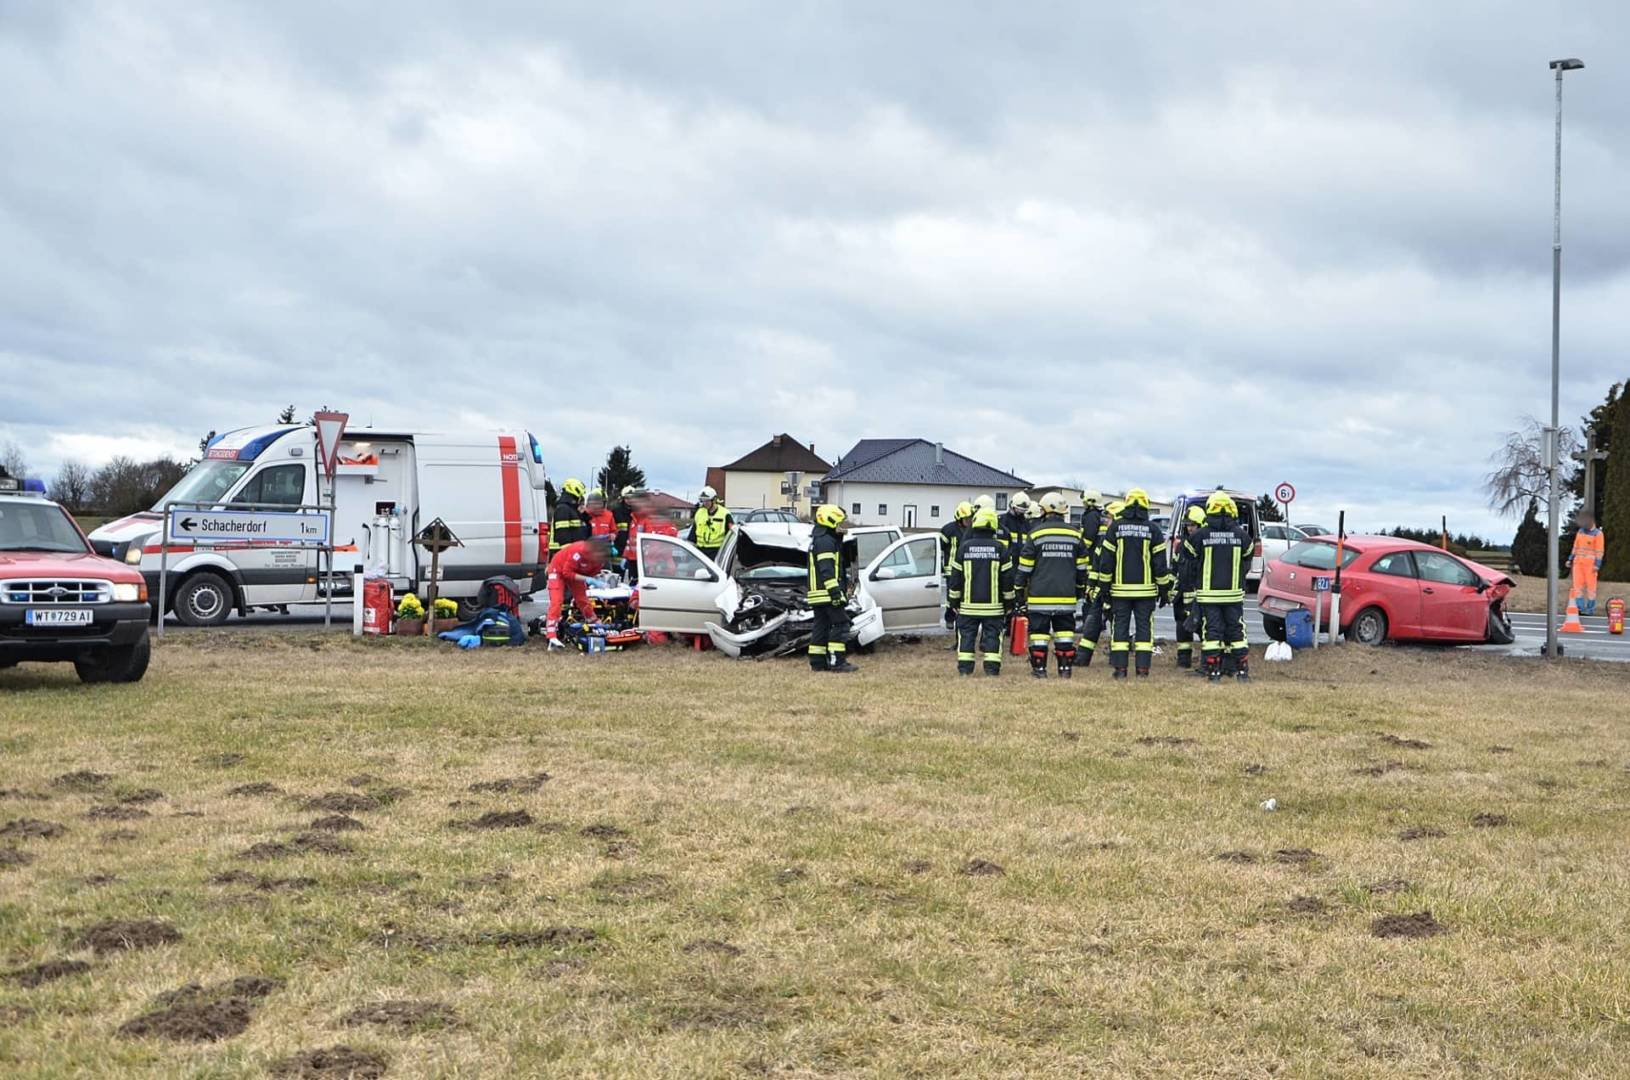 Drei Verletzte nach schwerem Verkehrsunfall in Vitis